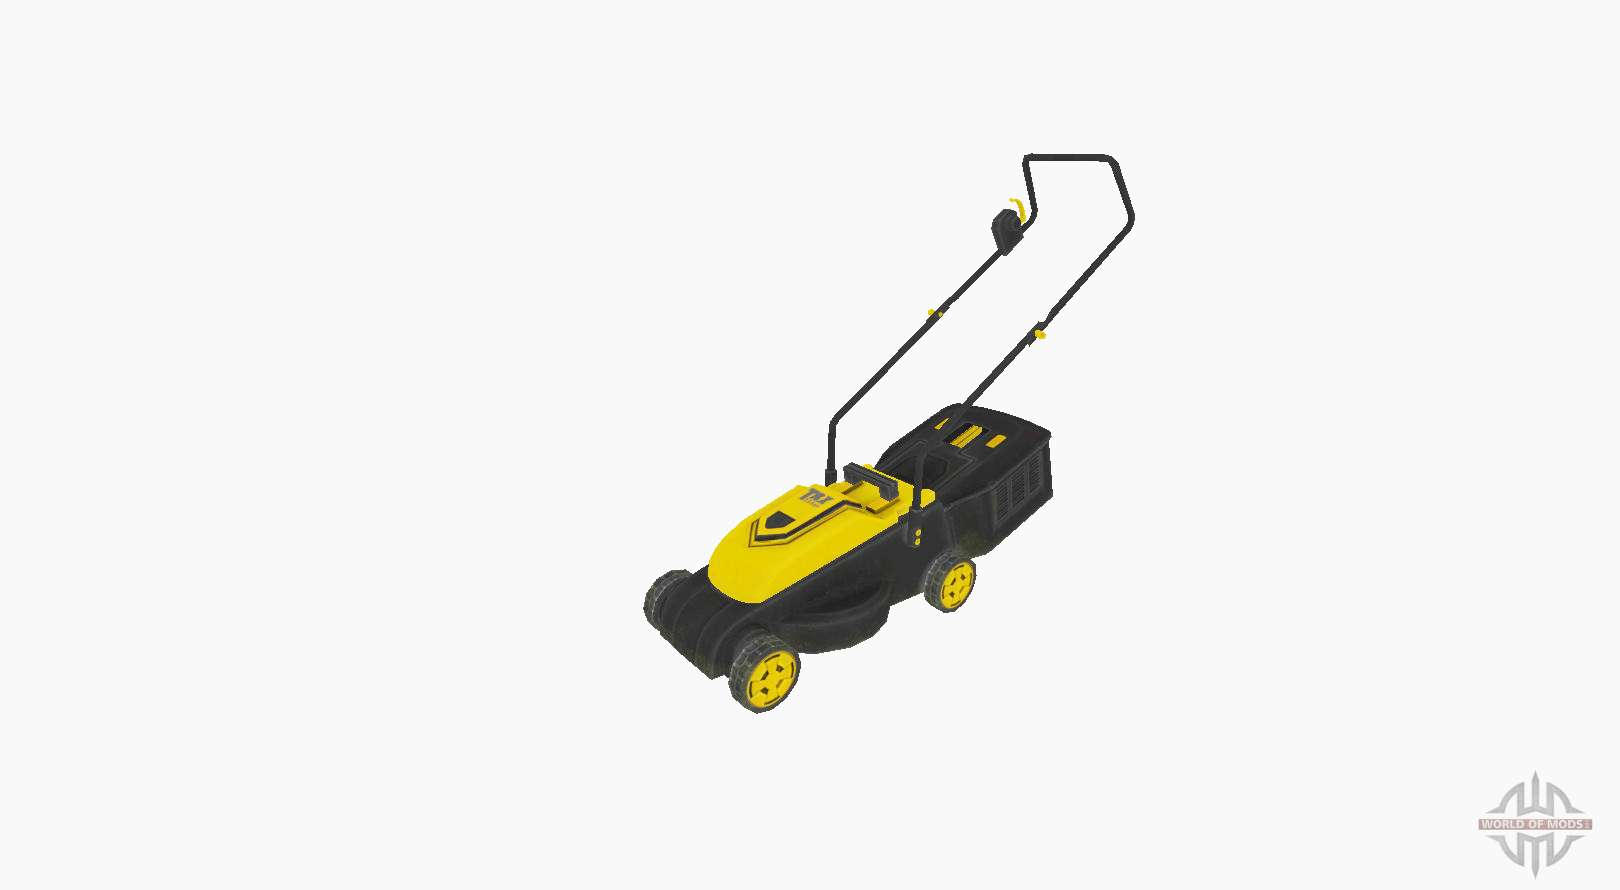 l u0026 39 essence tondeuse  u00e0 gazon pour farming simulator 2017